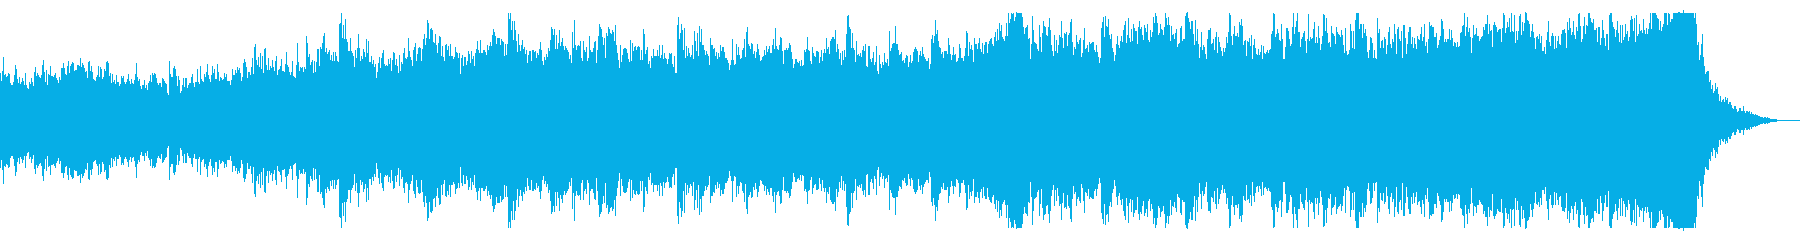 Mysterious Power60秒版の再生済みの波形